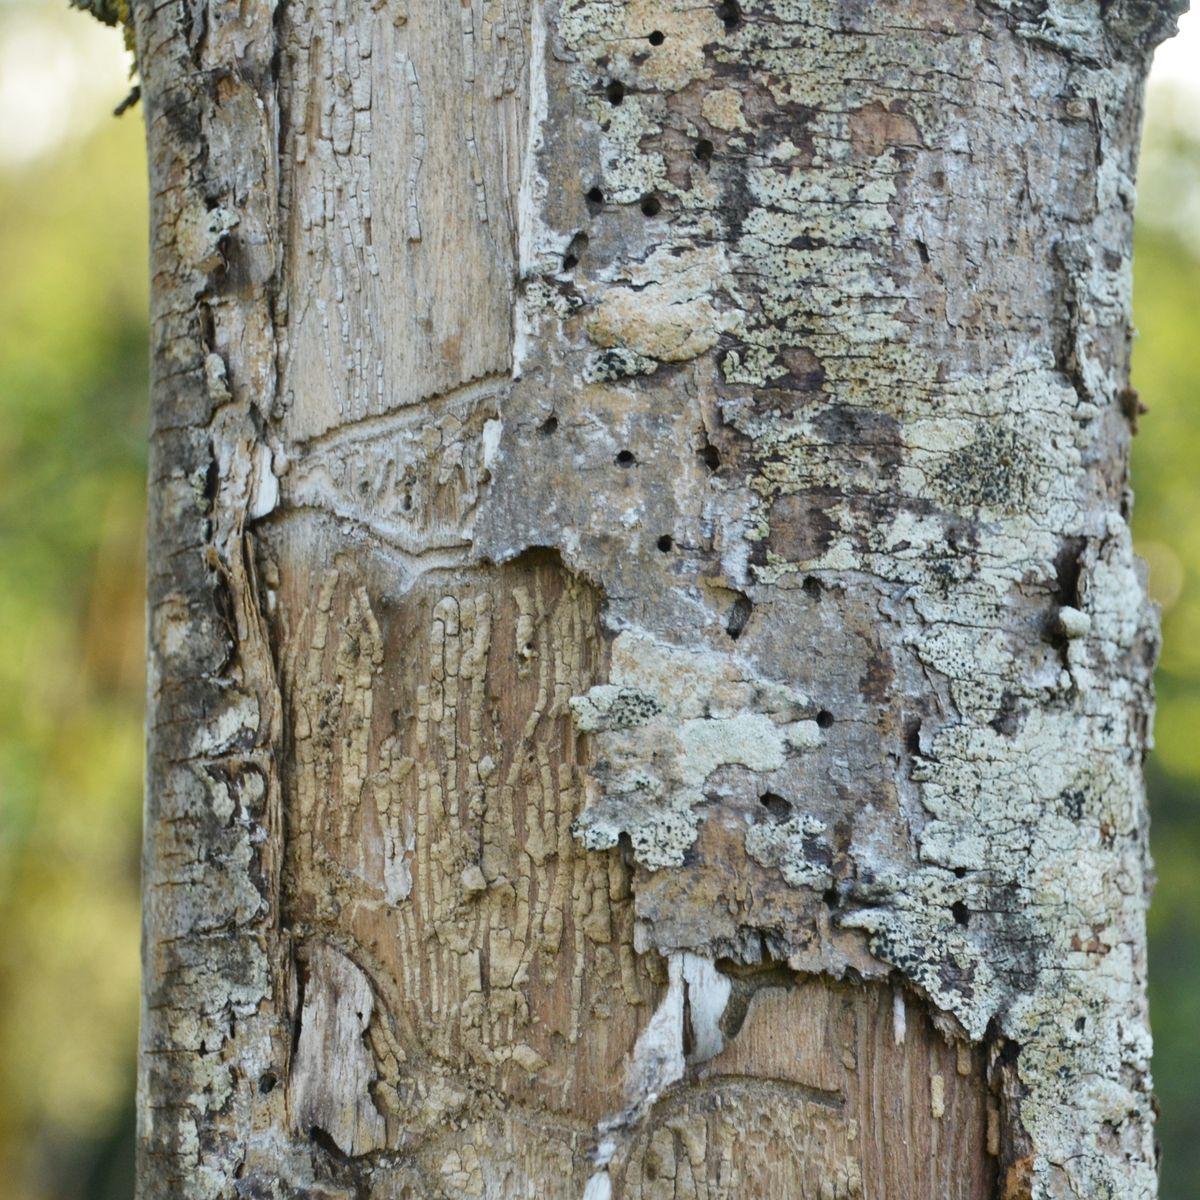 Eschentriebsterben - Pilz bedroht heimische Eschen